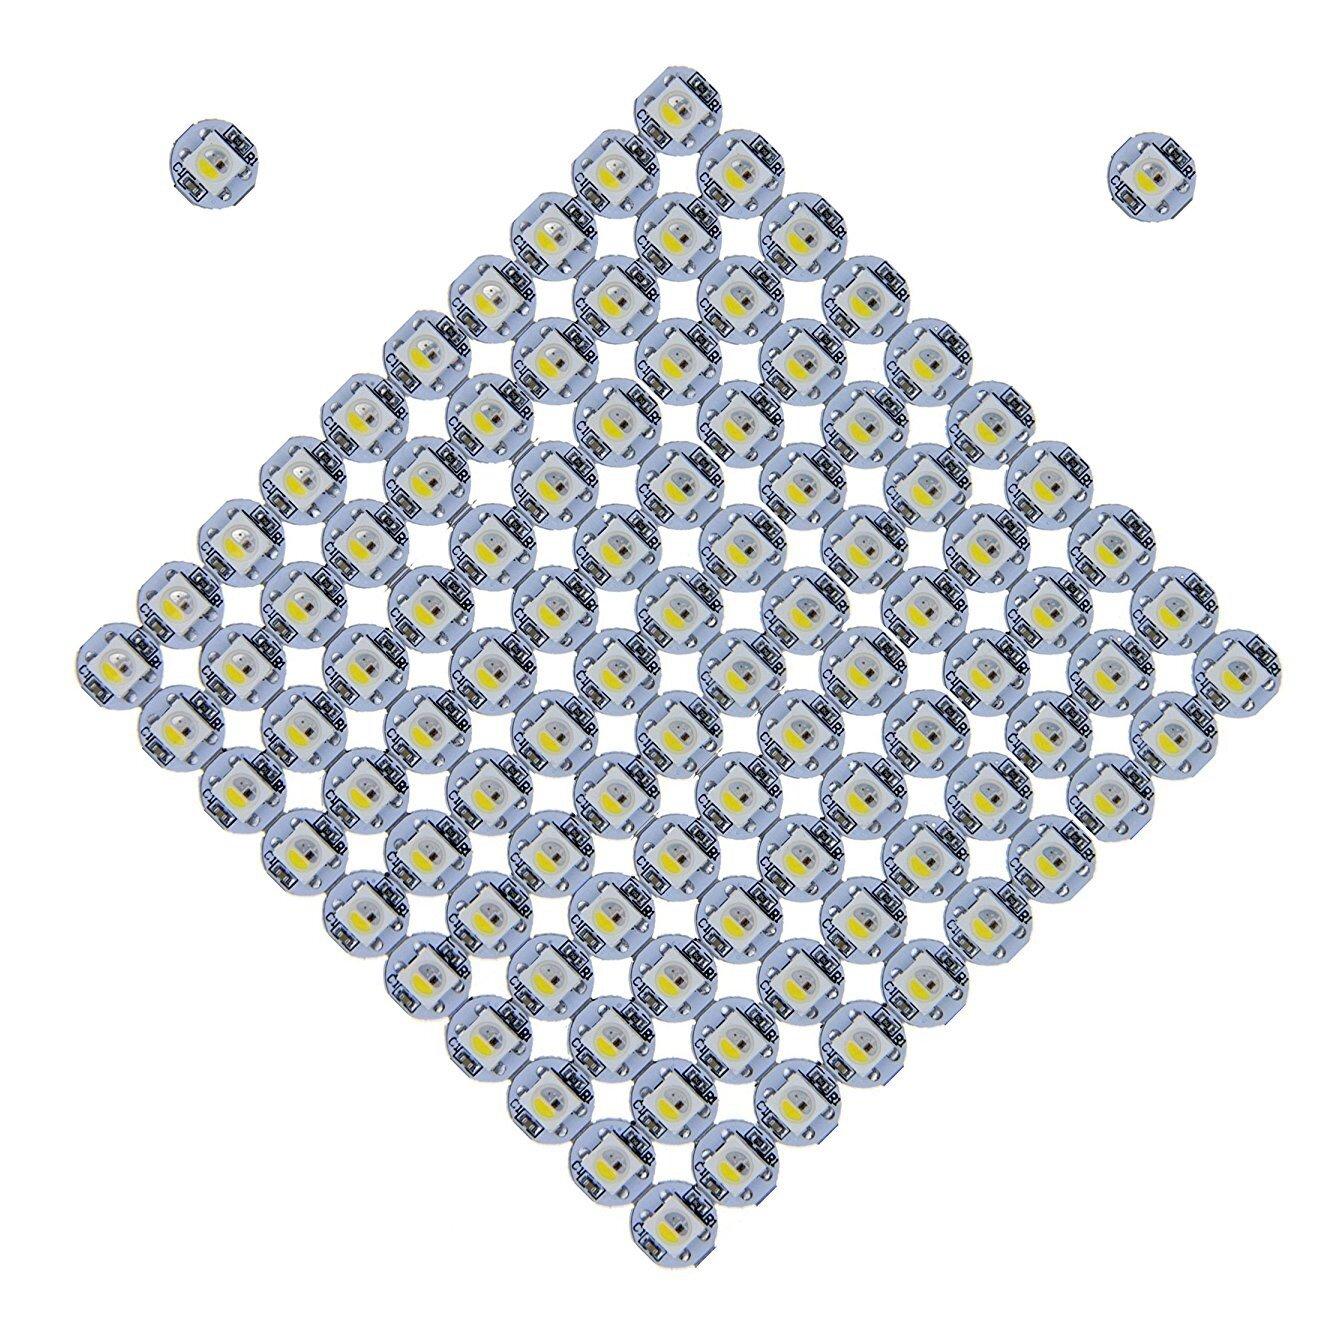 innovative design a698c 9dd67 100PCS SK6812 WS2812B RGBW RGBWW Individually Addressable LED Chip Board  for Arduino DIY Lighting